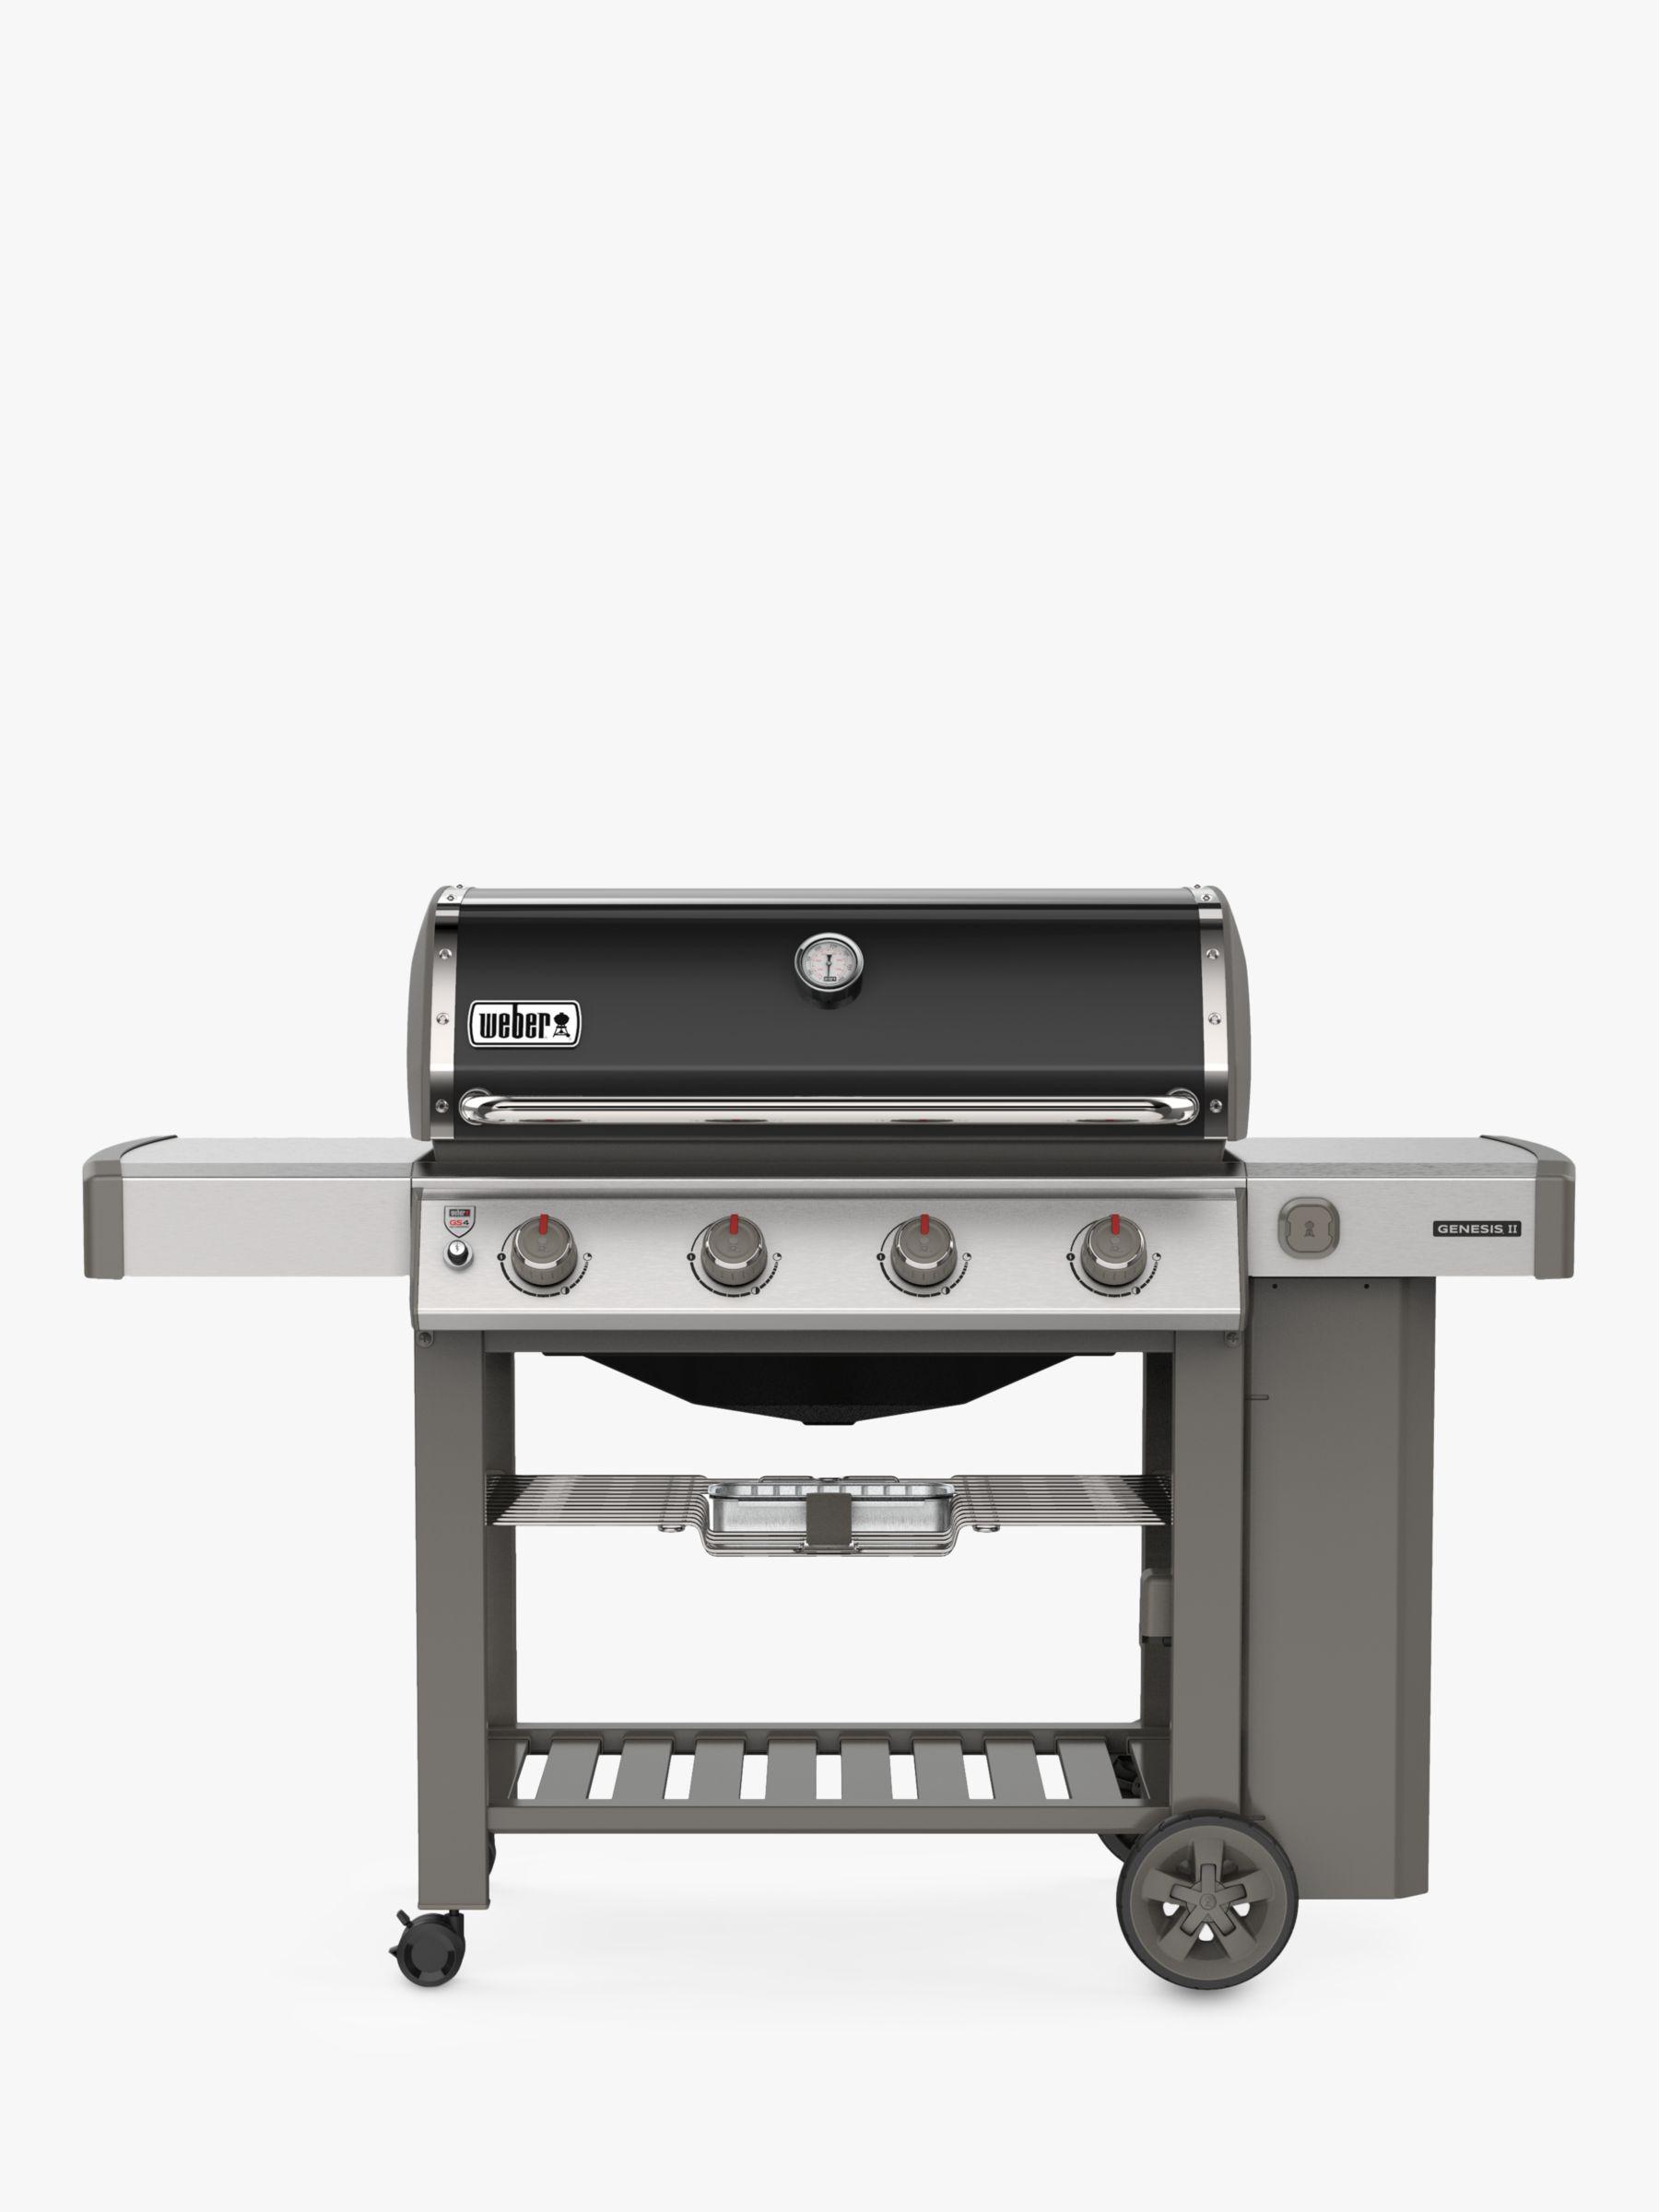 Weber Weber Genesis II E-410 4-Burner Gas BBQ, Black